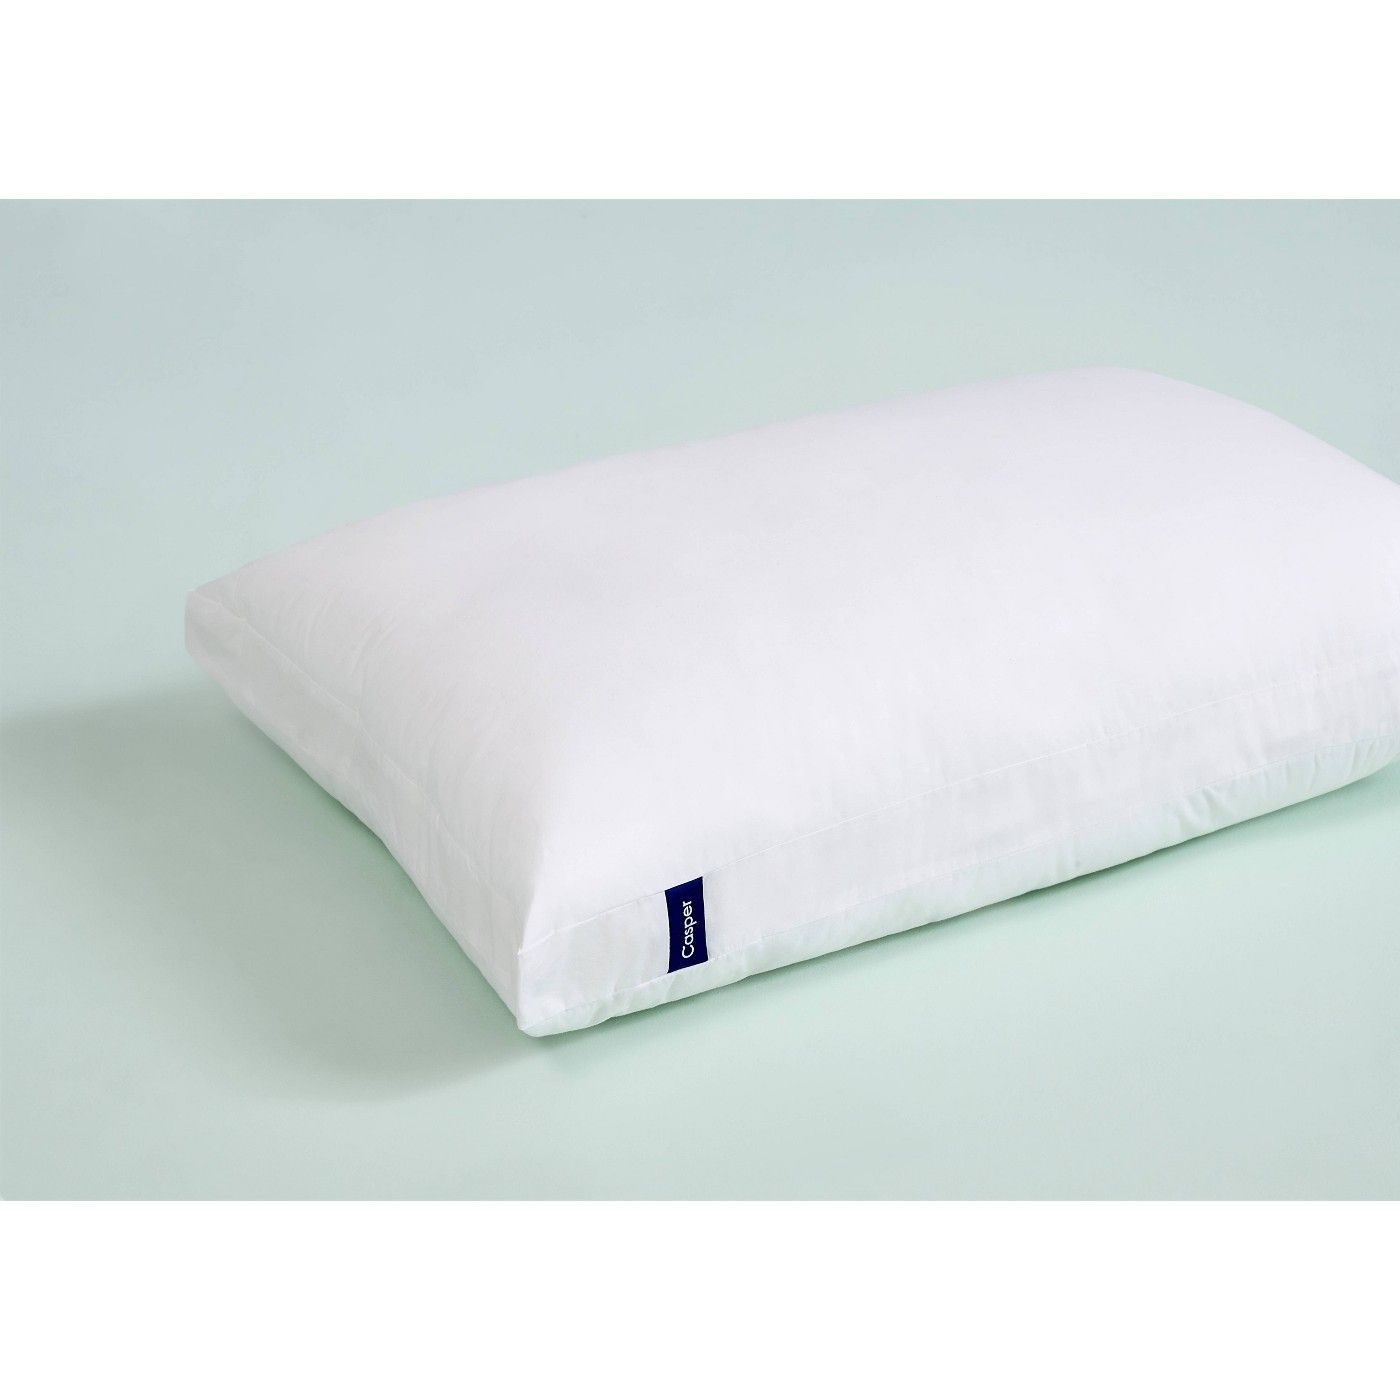 casper sleep pillow dual layer design 100 cotton cover for sleeping king white